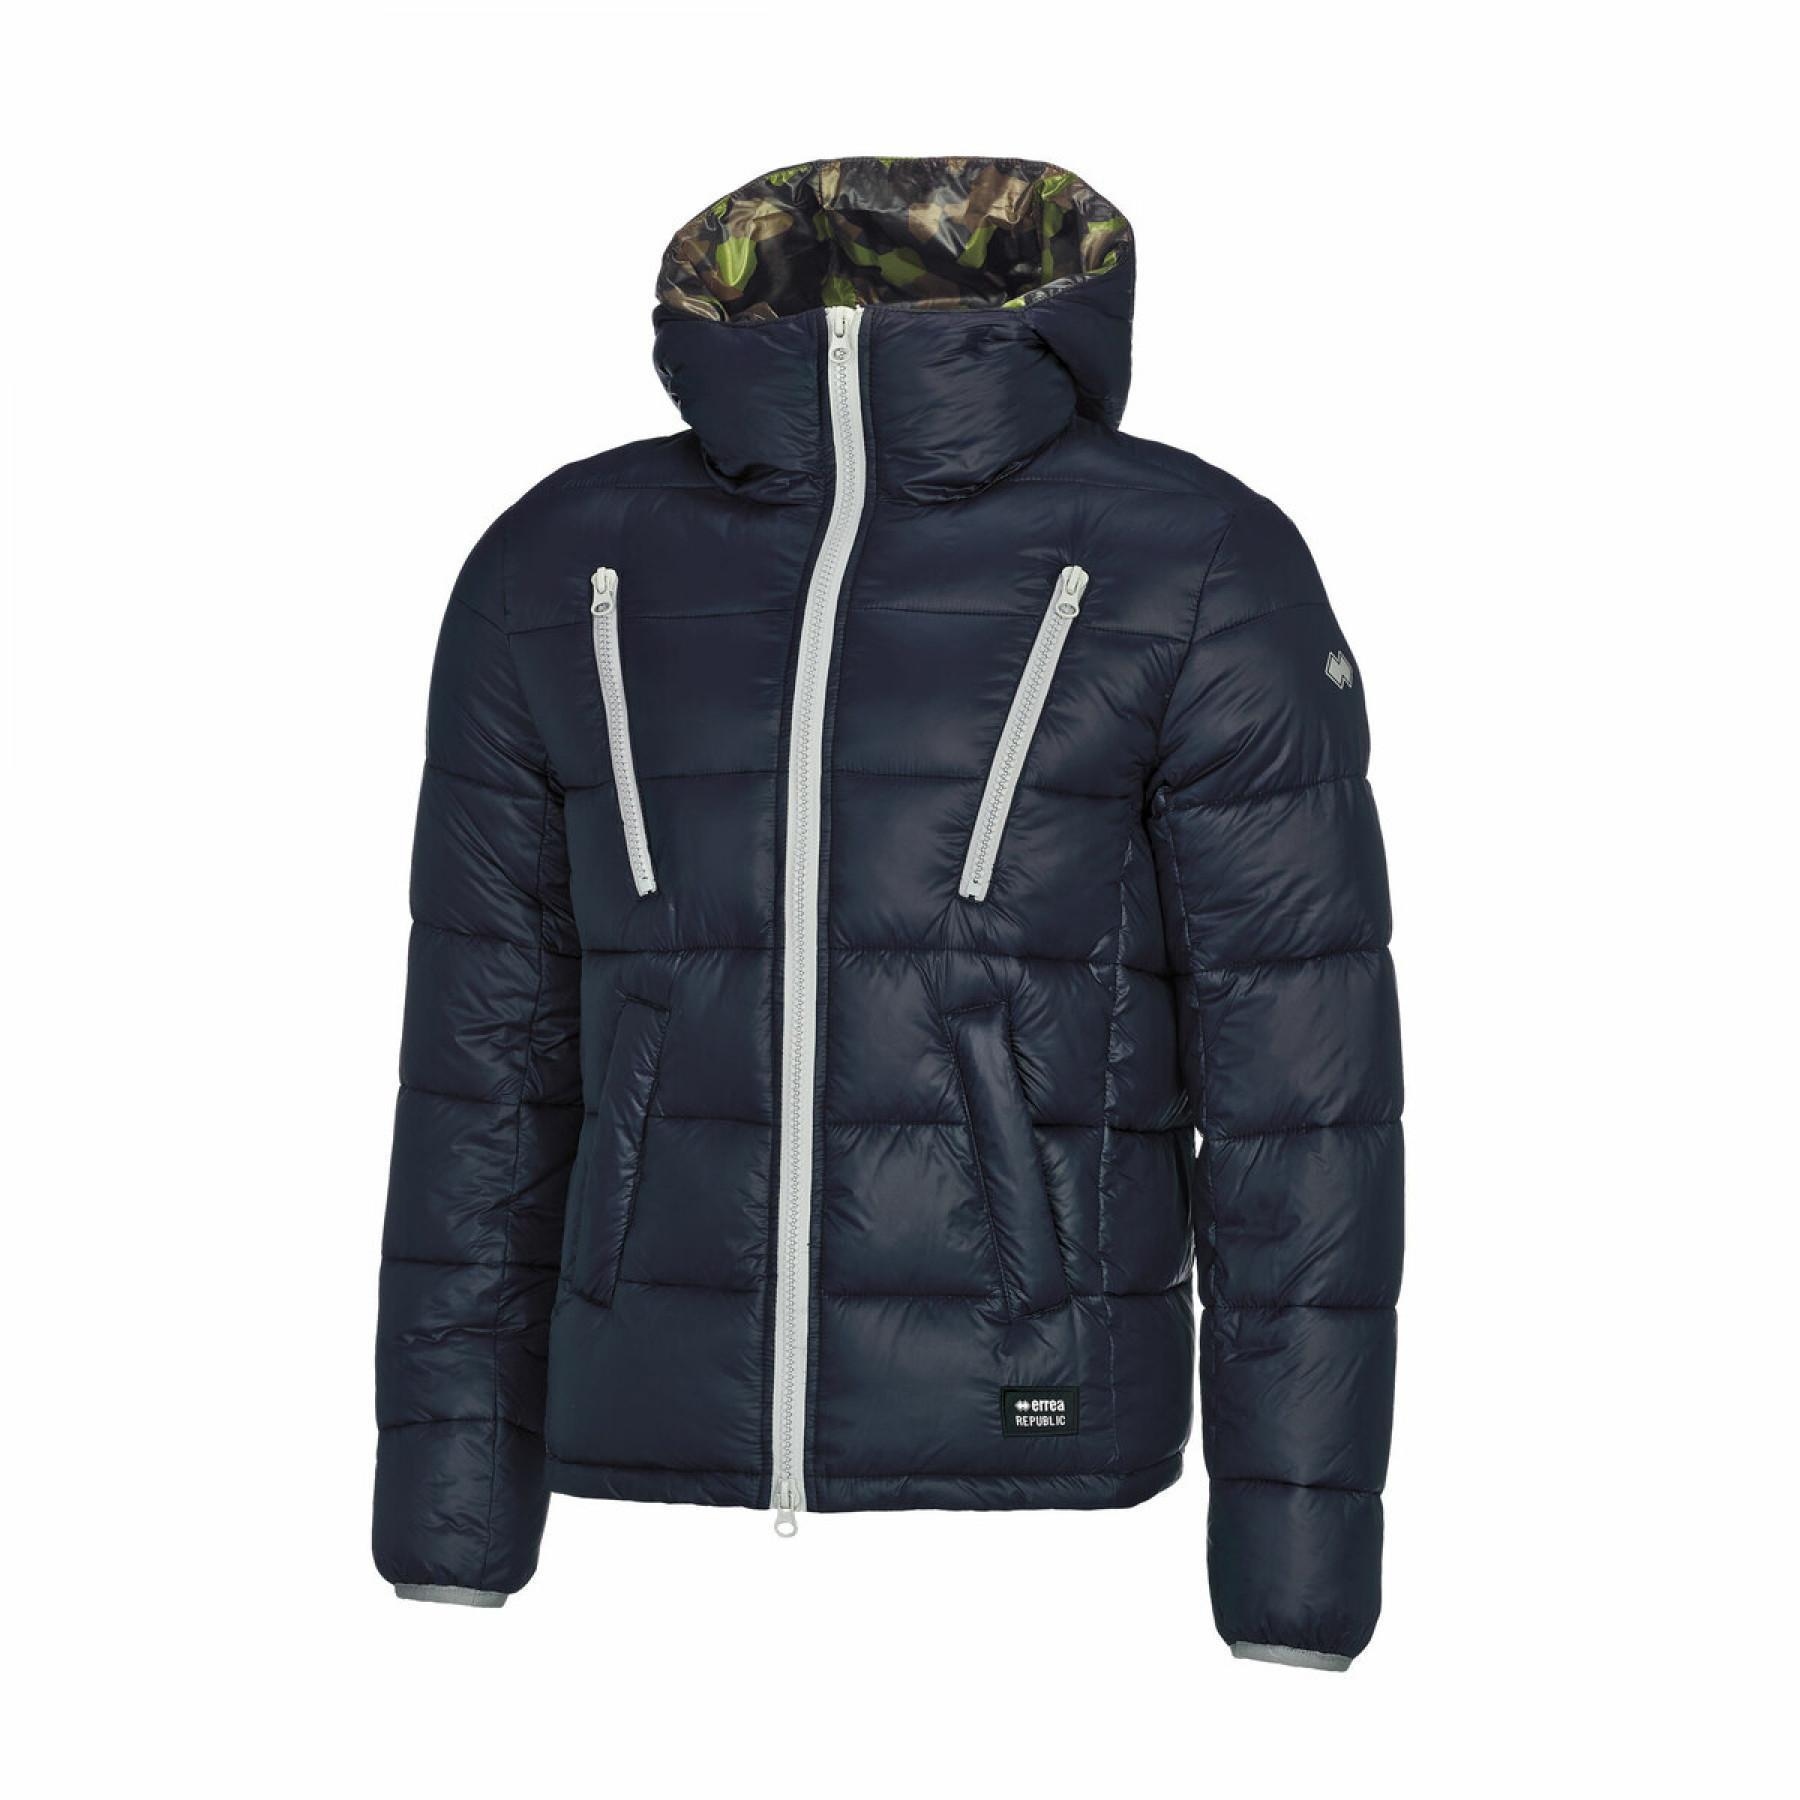 Errea hybrid quilted jacket